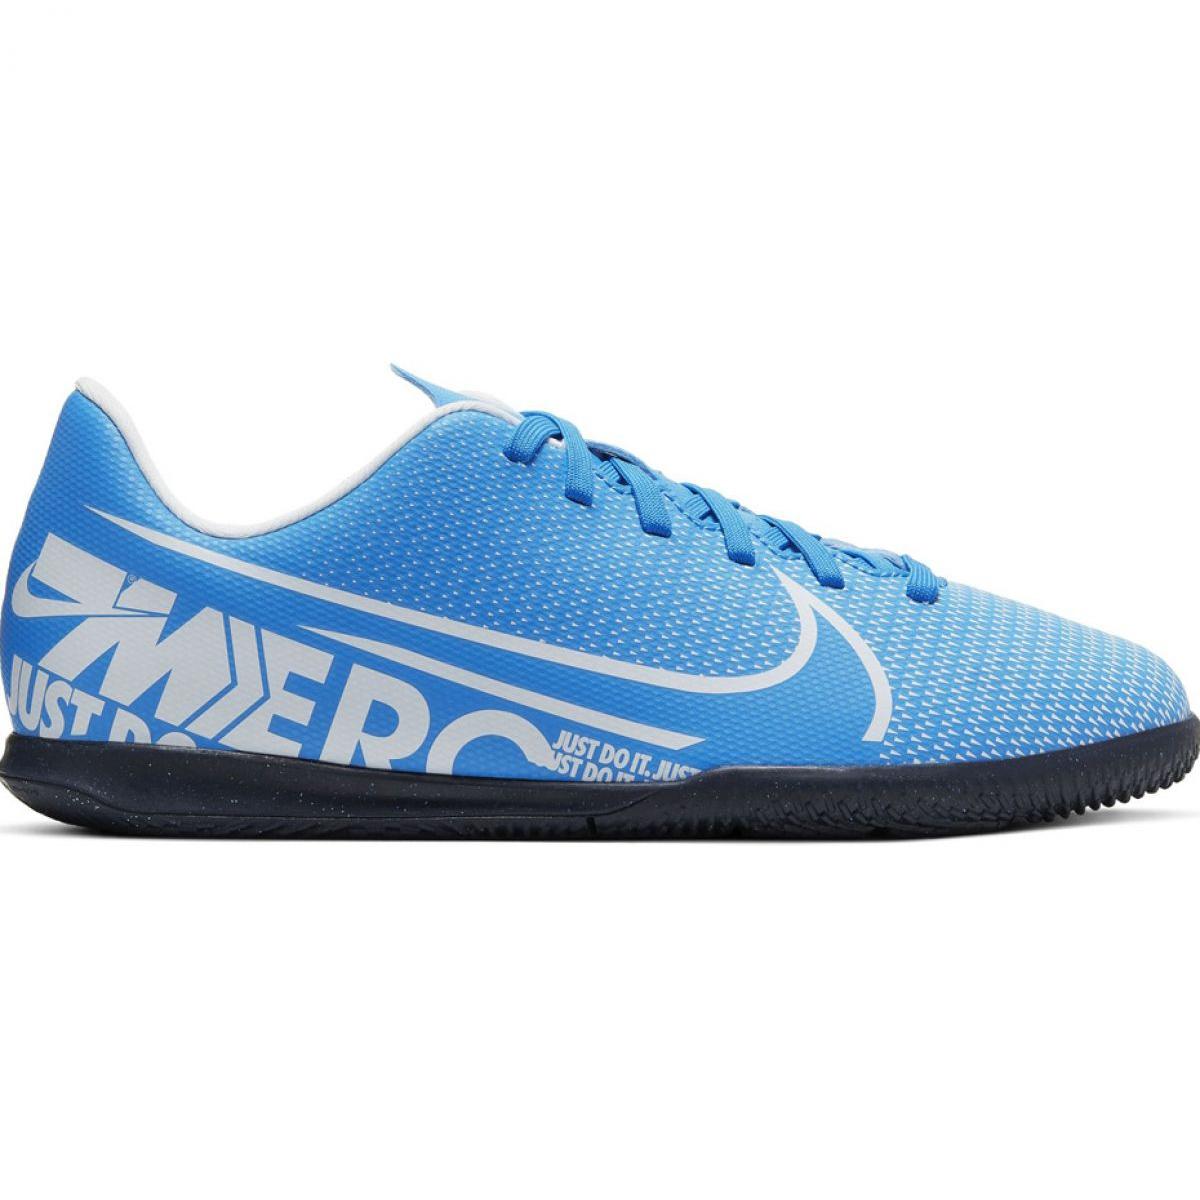 Sapatos de futebol Nike Mercurial Vapor 13 Clube Ic Jr. AT8169 414 azul azul